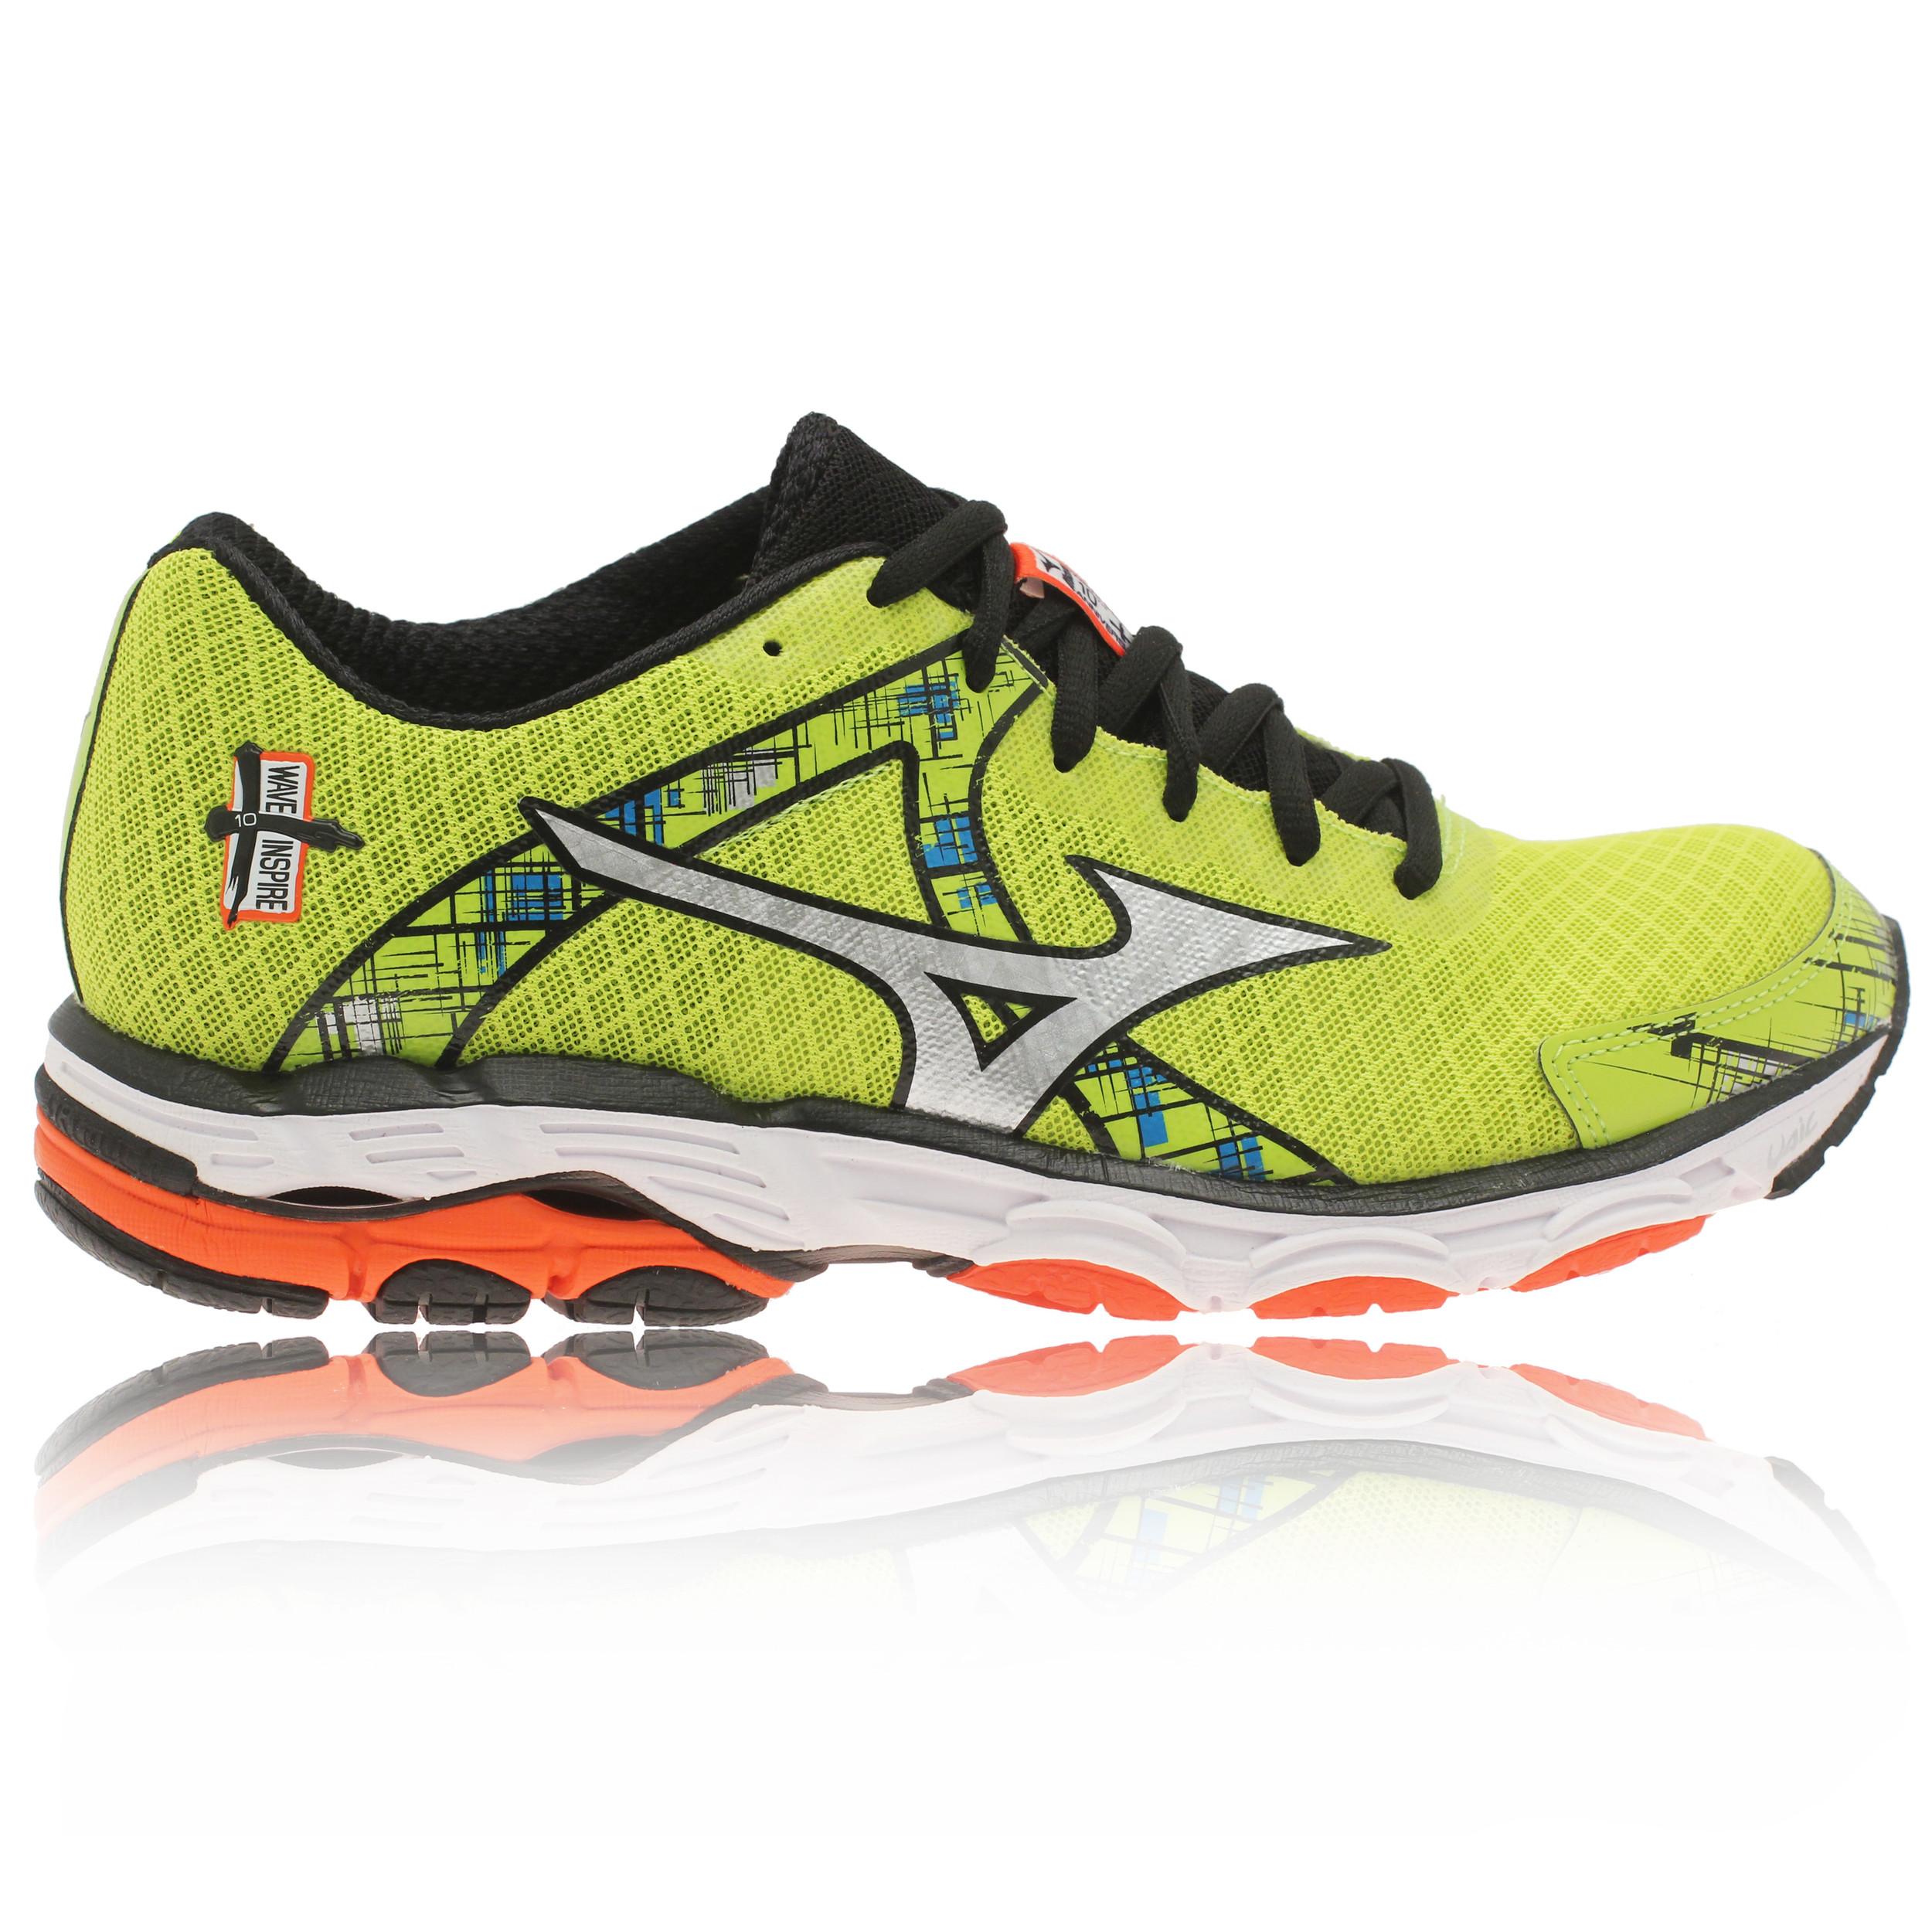 Mens Mizuno Running Shoes & Clothes   SportsShoes.com